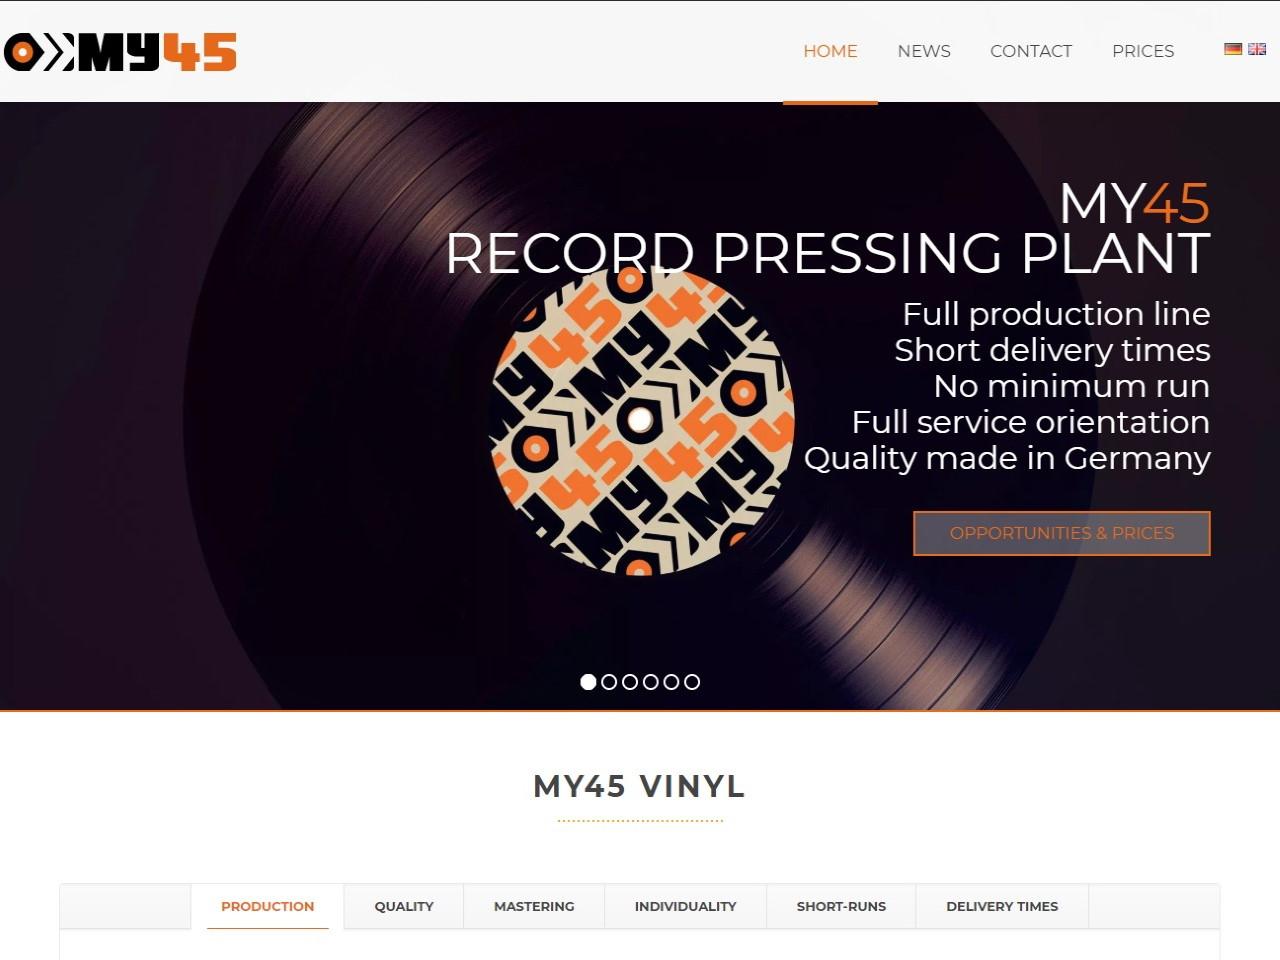 My45 German record pressing plant